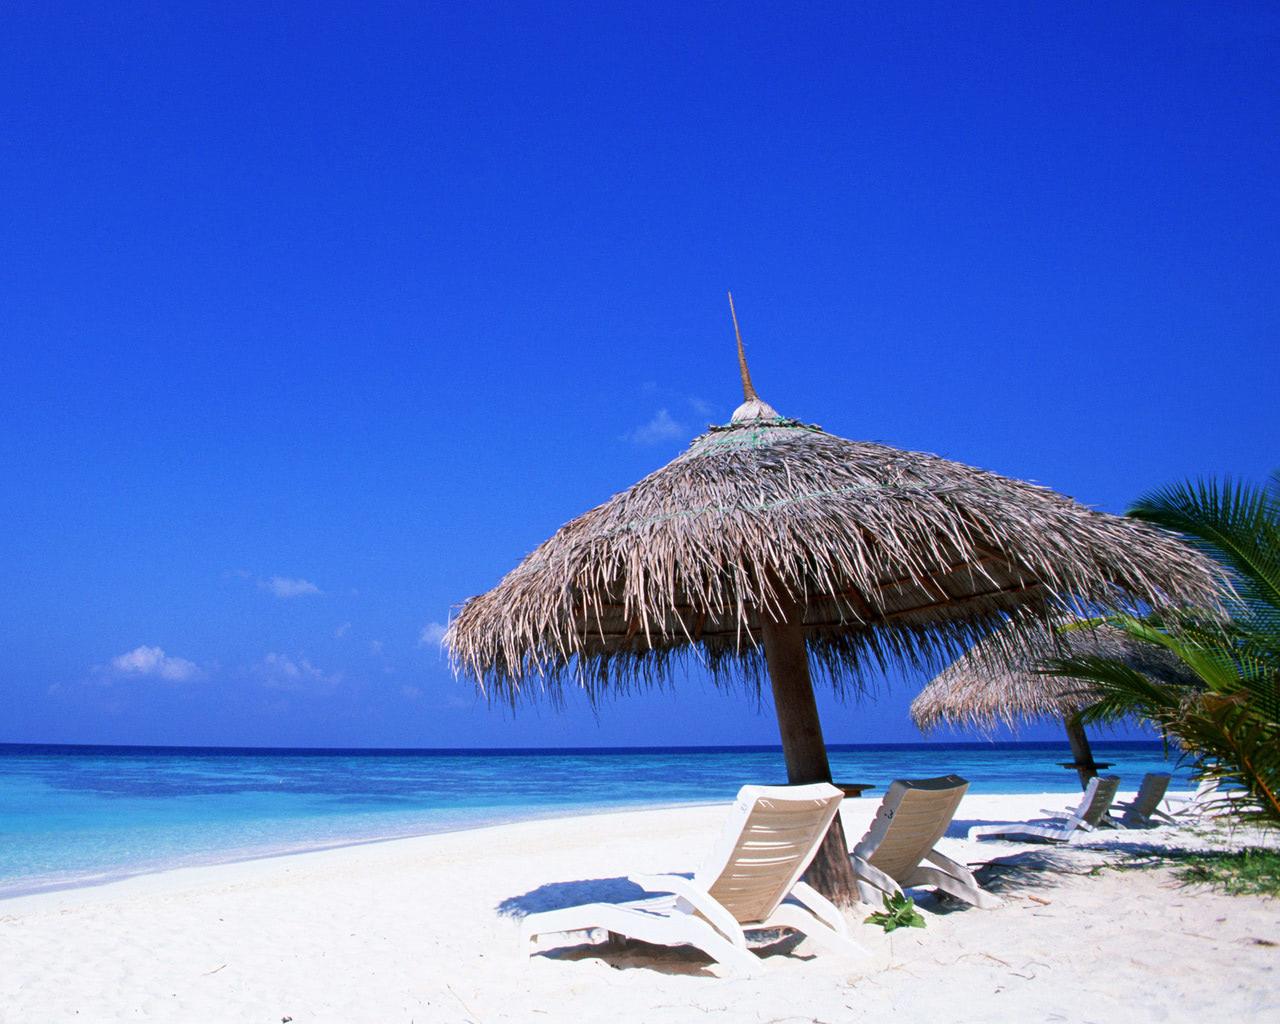 tropical sandy beach and blue ocean wallpaper - beach wallpapers